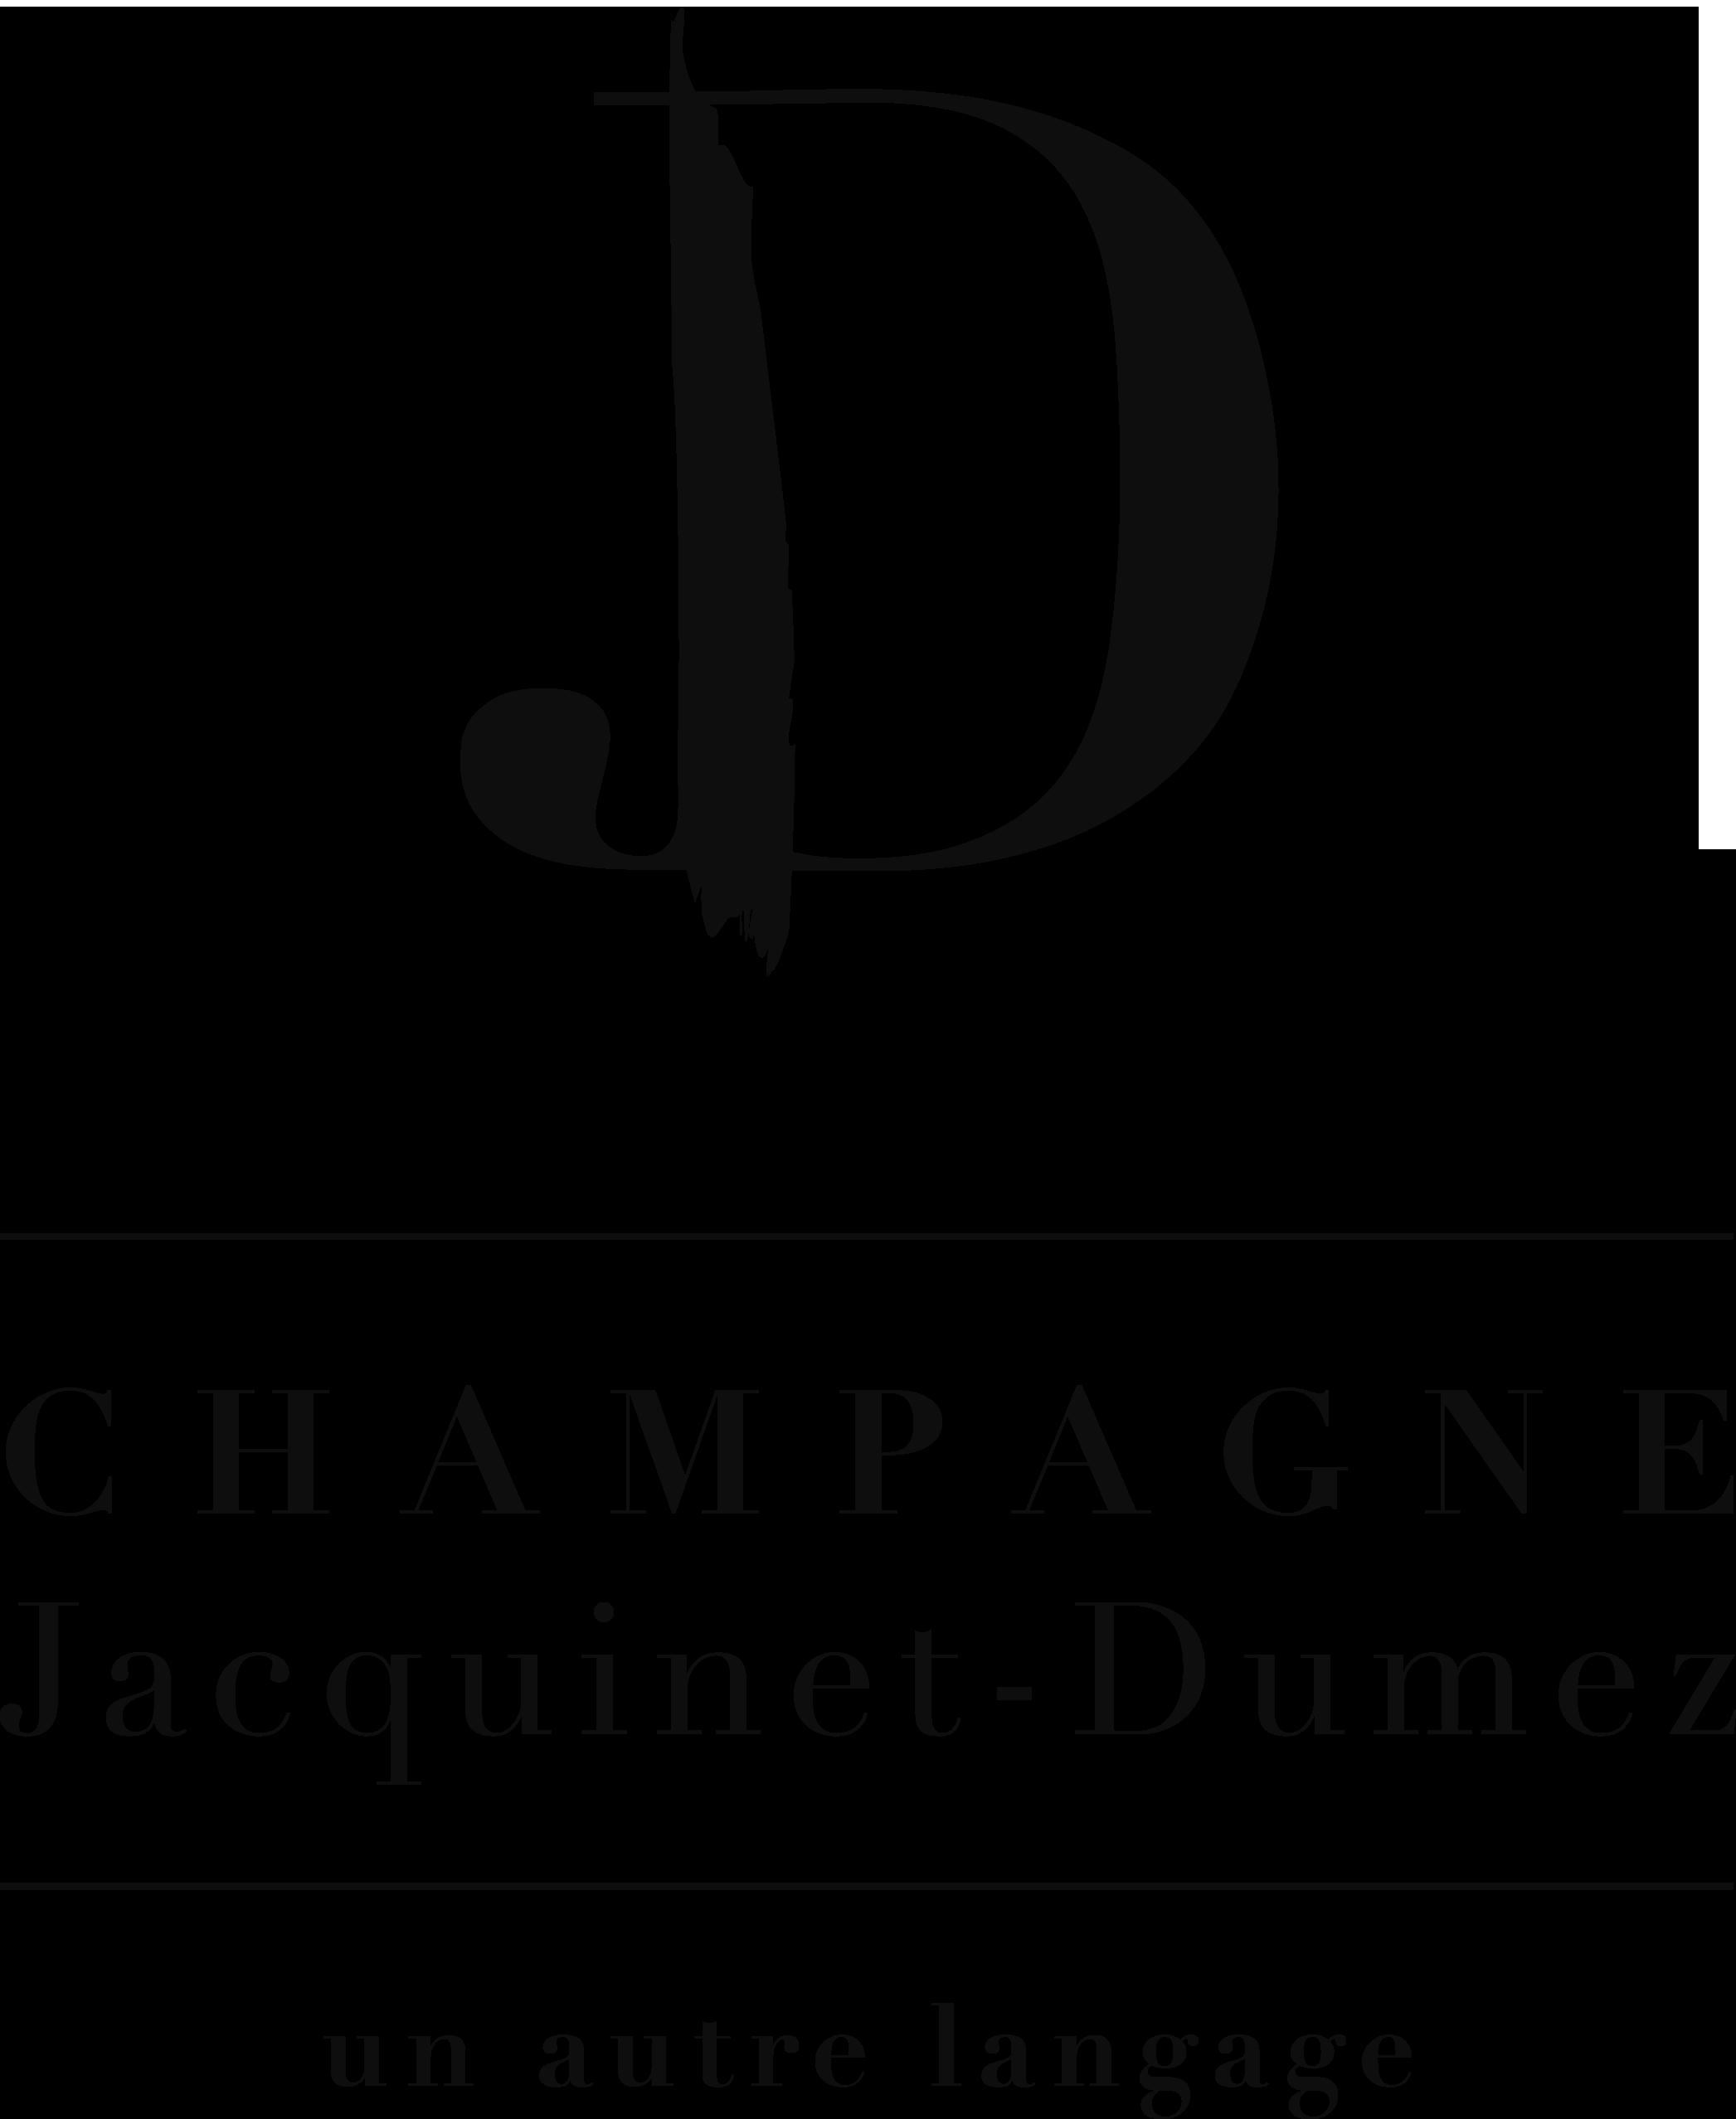 LOGO JACQUINET DUMEZ